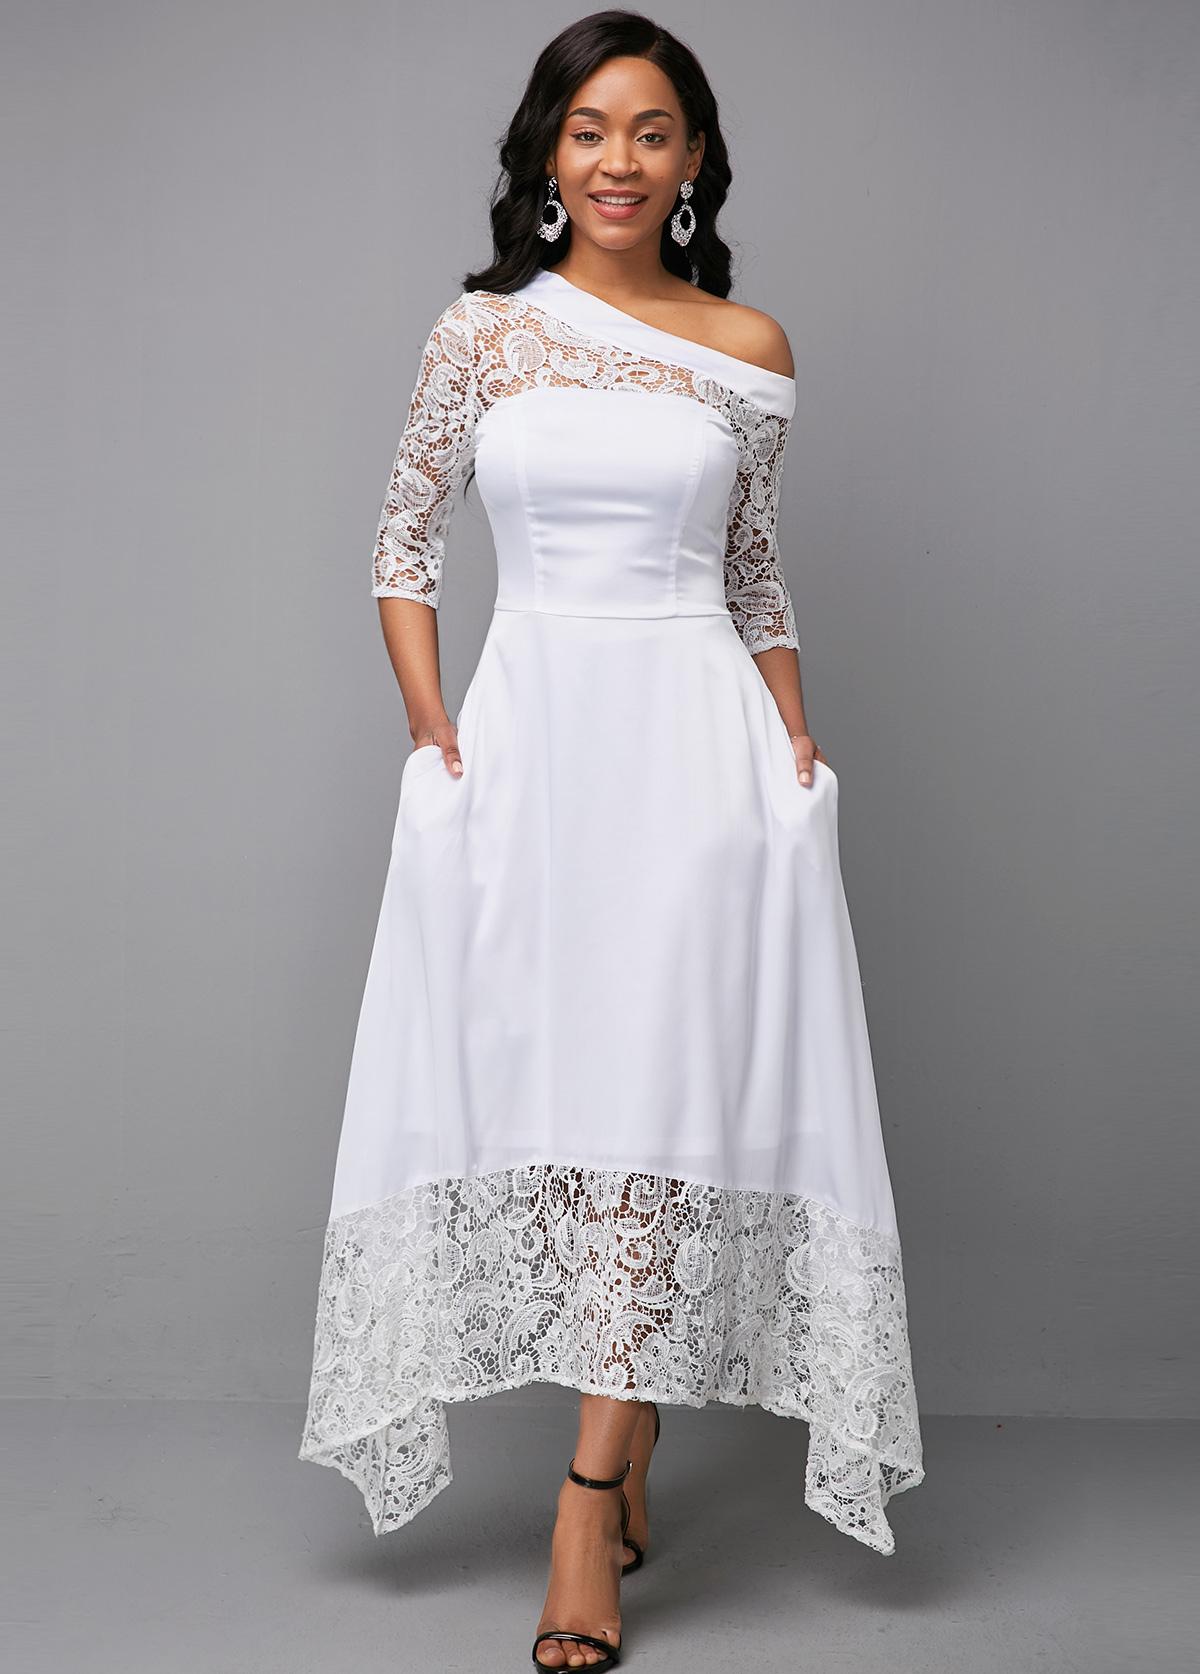 White Lace Patchwork Three Quarter Sleeve Dress